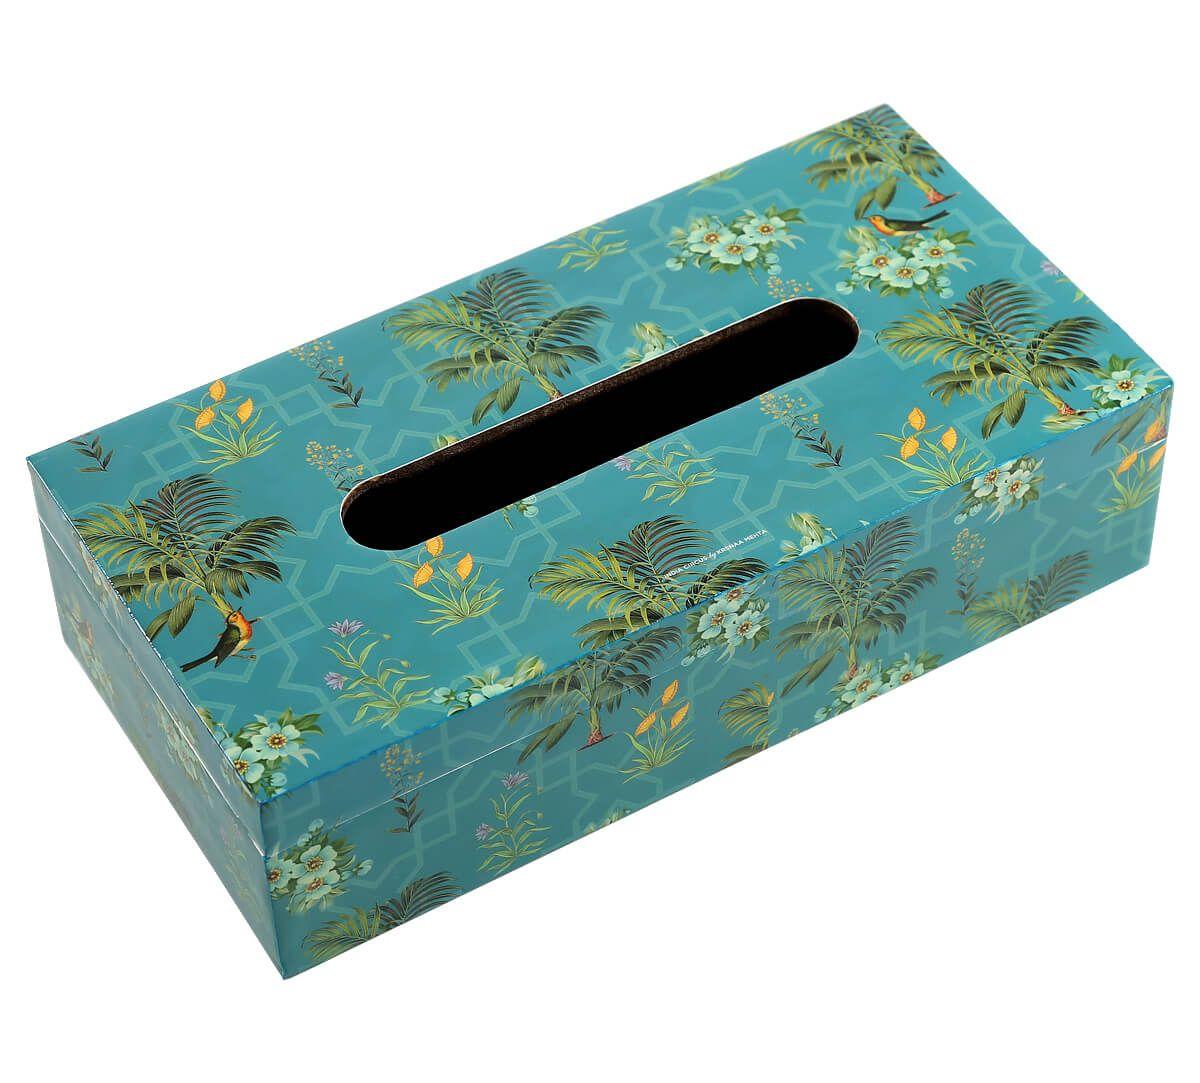 India Circus Robin Bird Park Tissue Box Holder